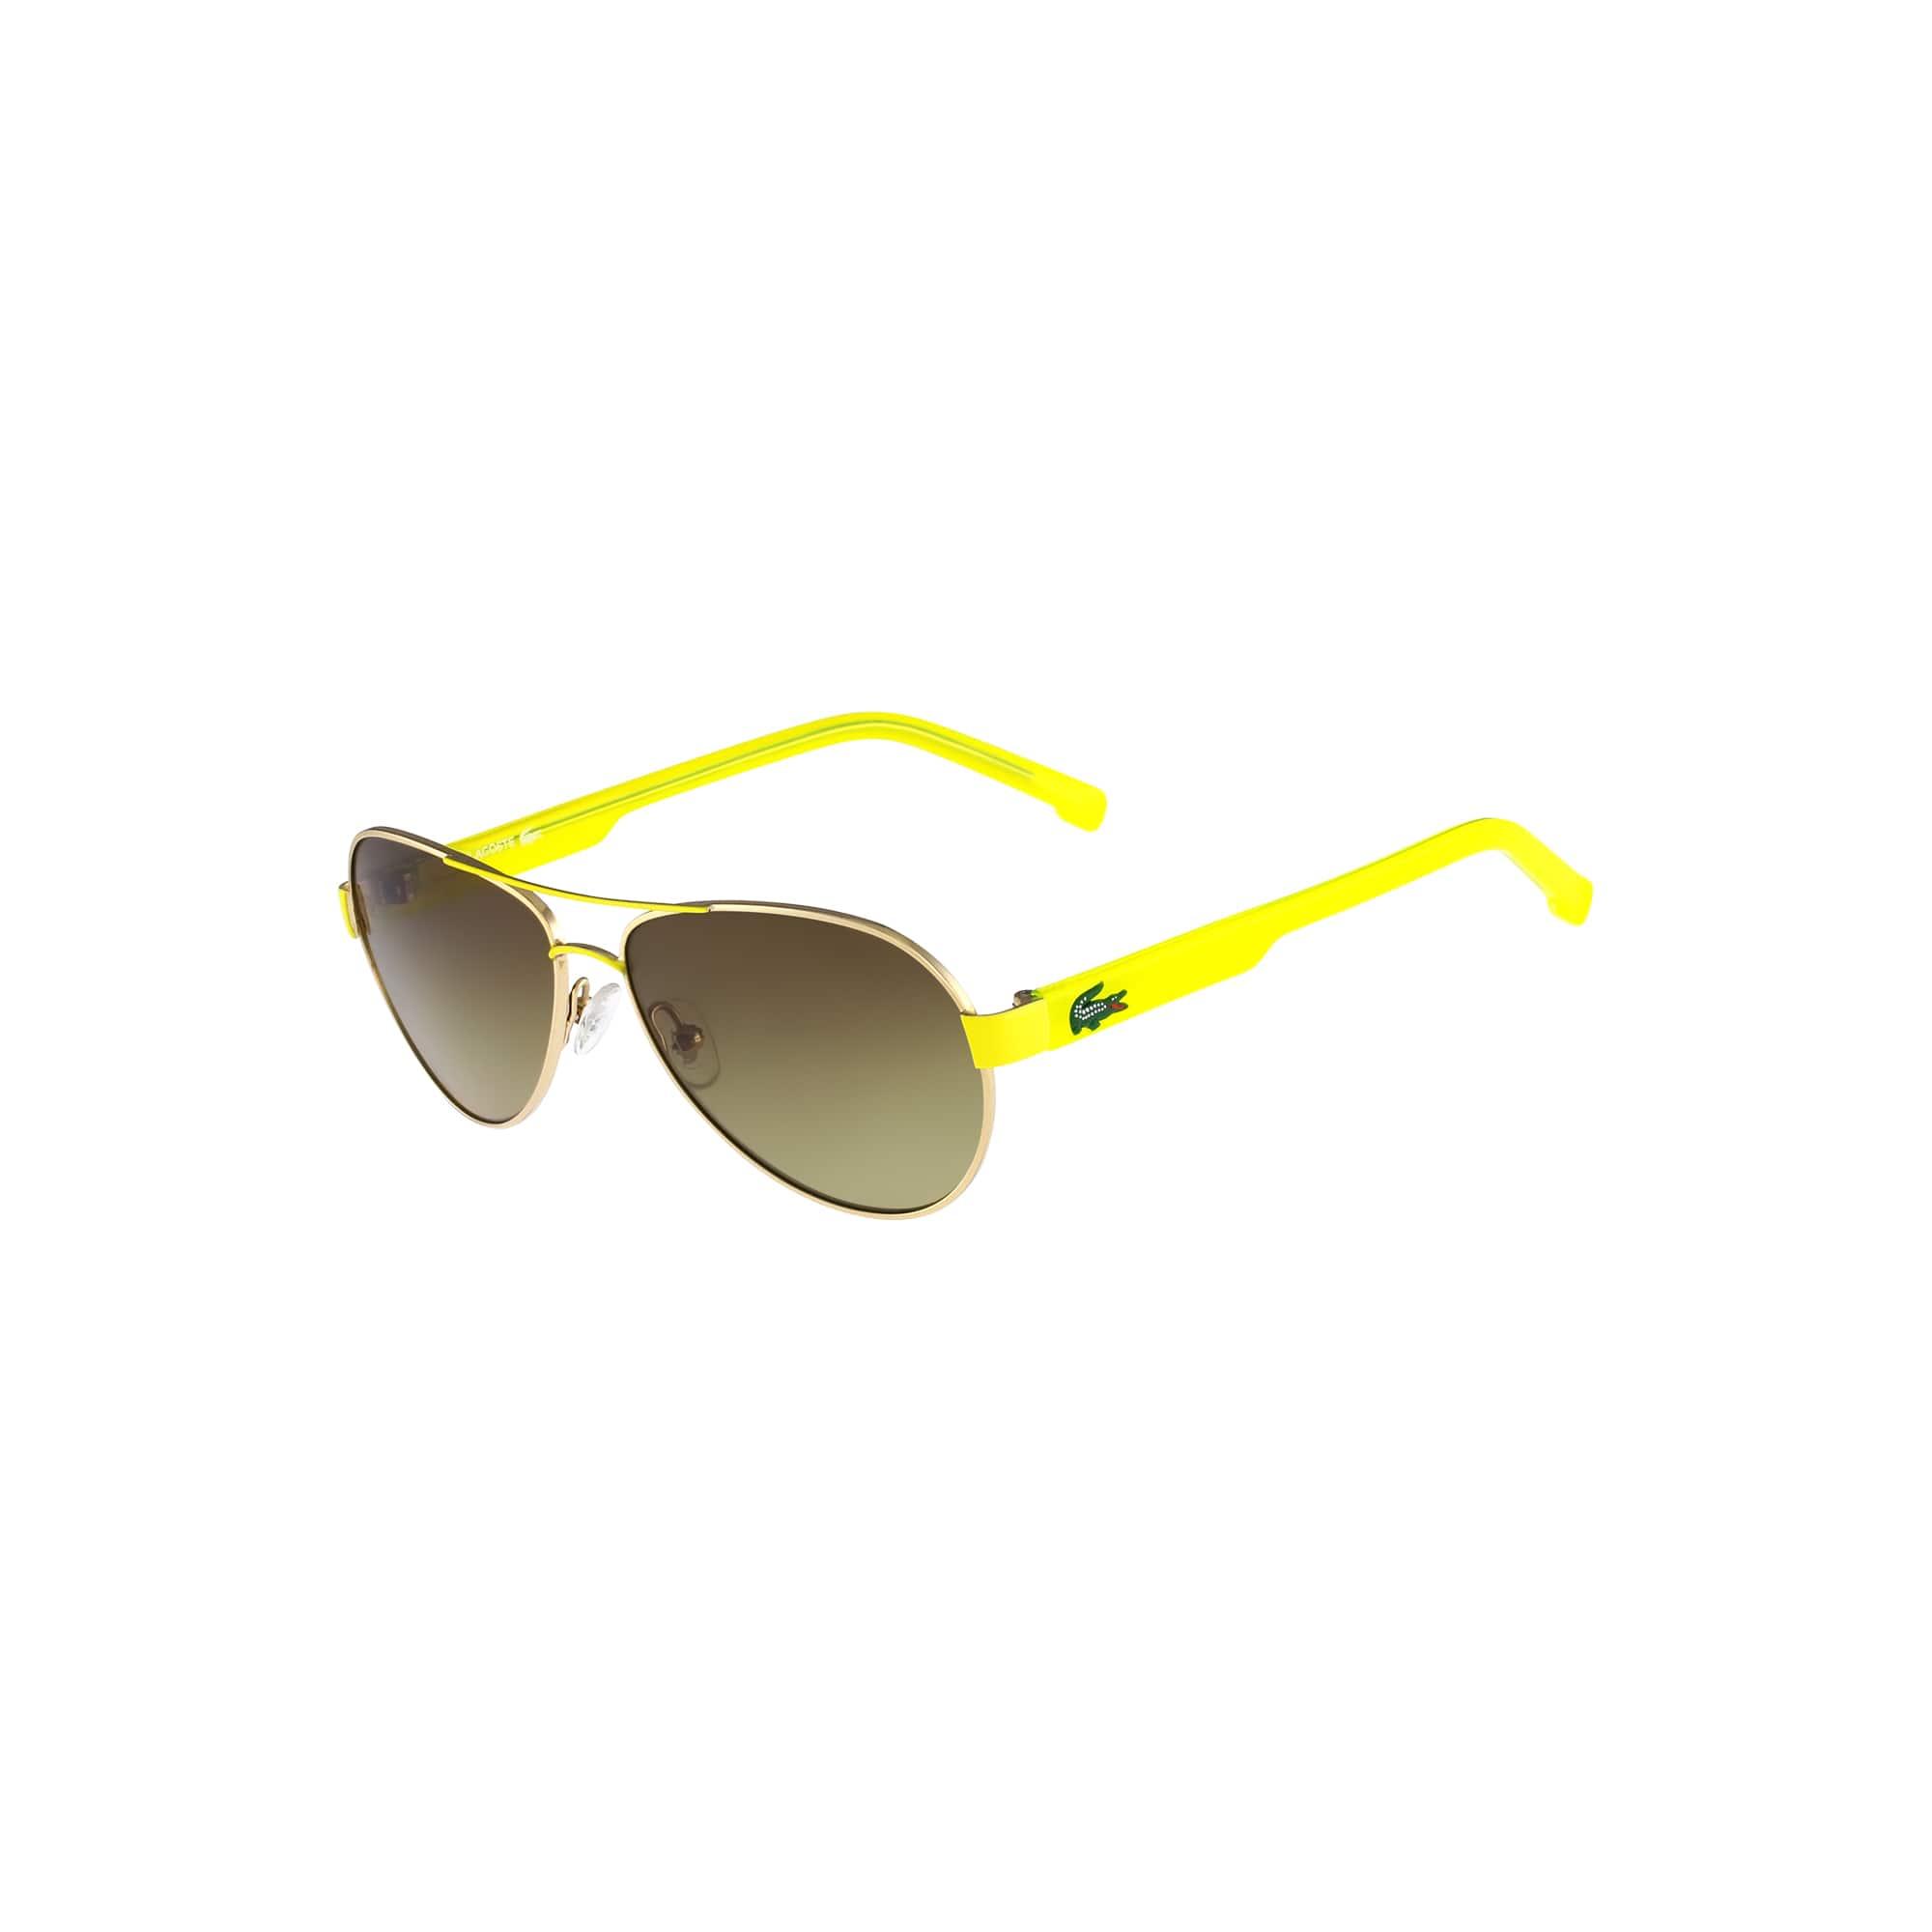 L.12.12 T(w)eens Sunglasses